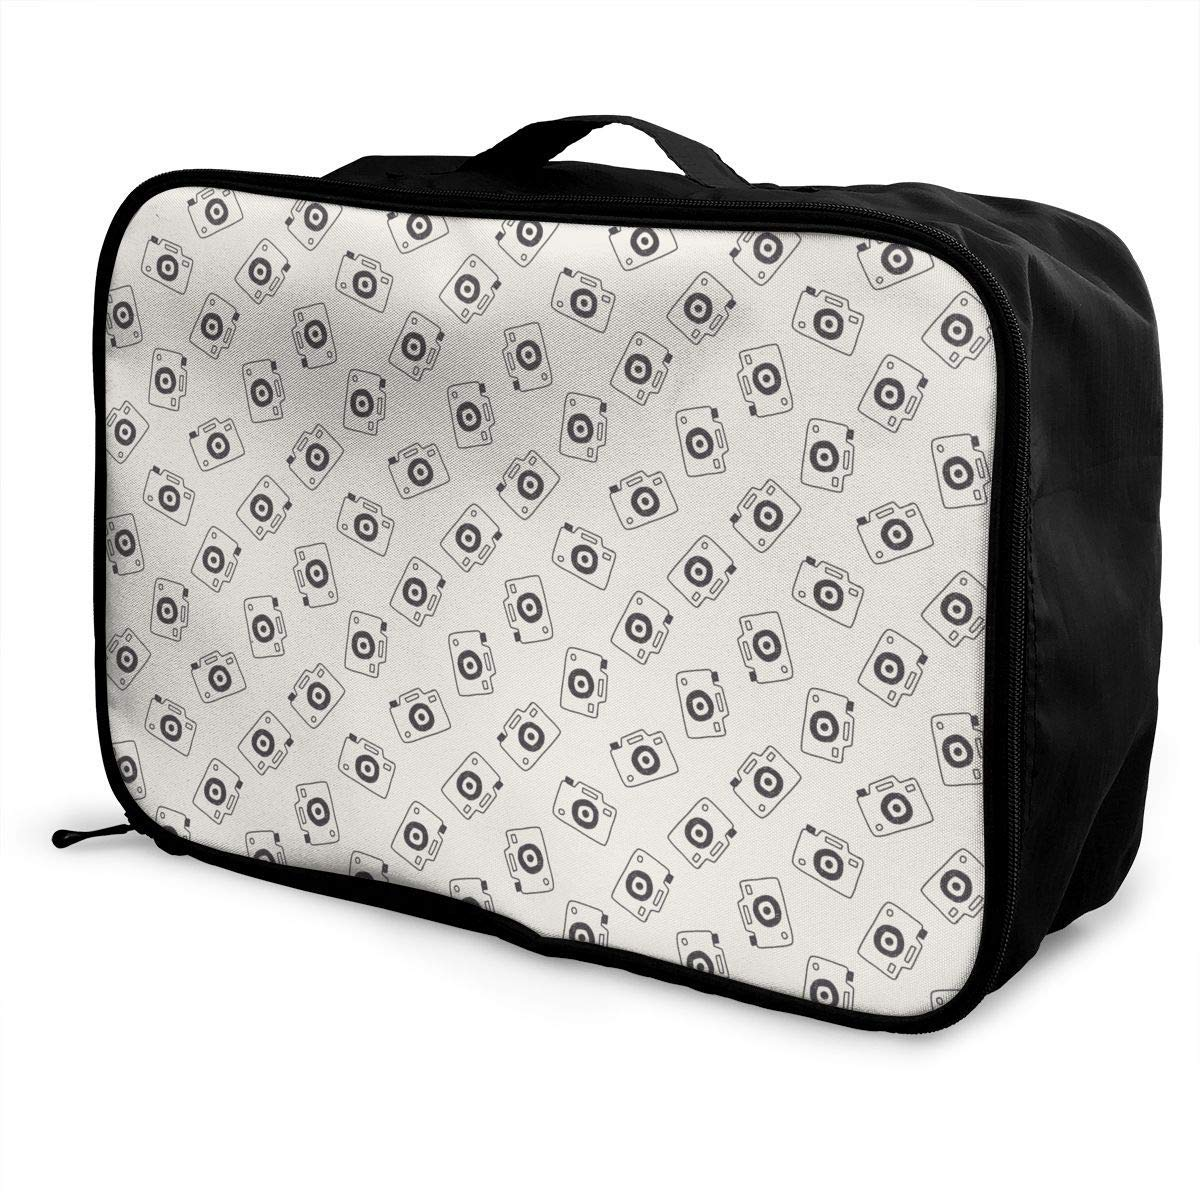 JTRVW Luggage Bags for Travel Lightweight Large Capacity Portable Duffel Bag for Men /& Women Camera Pattern Travel Duffel Bag Backpack